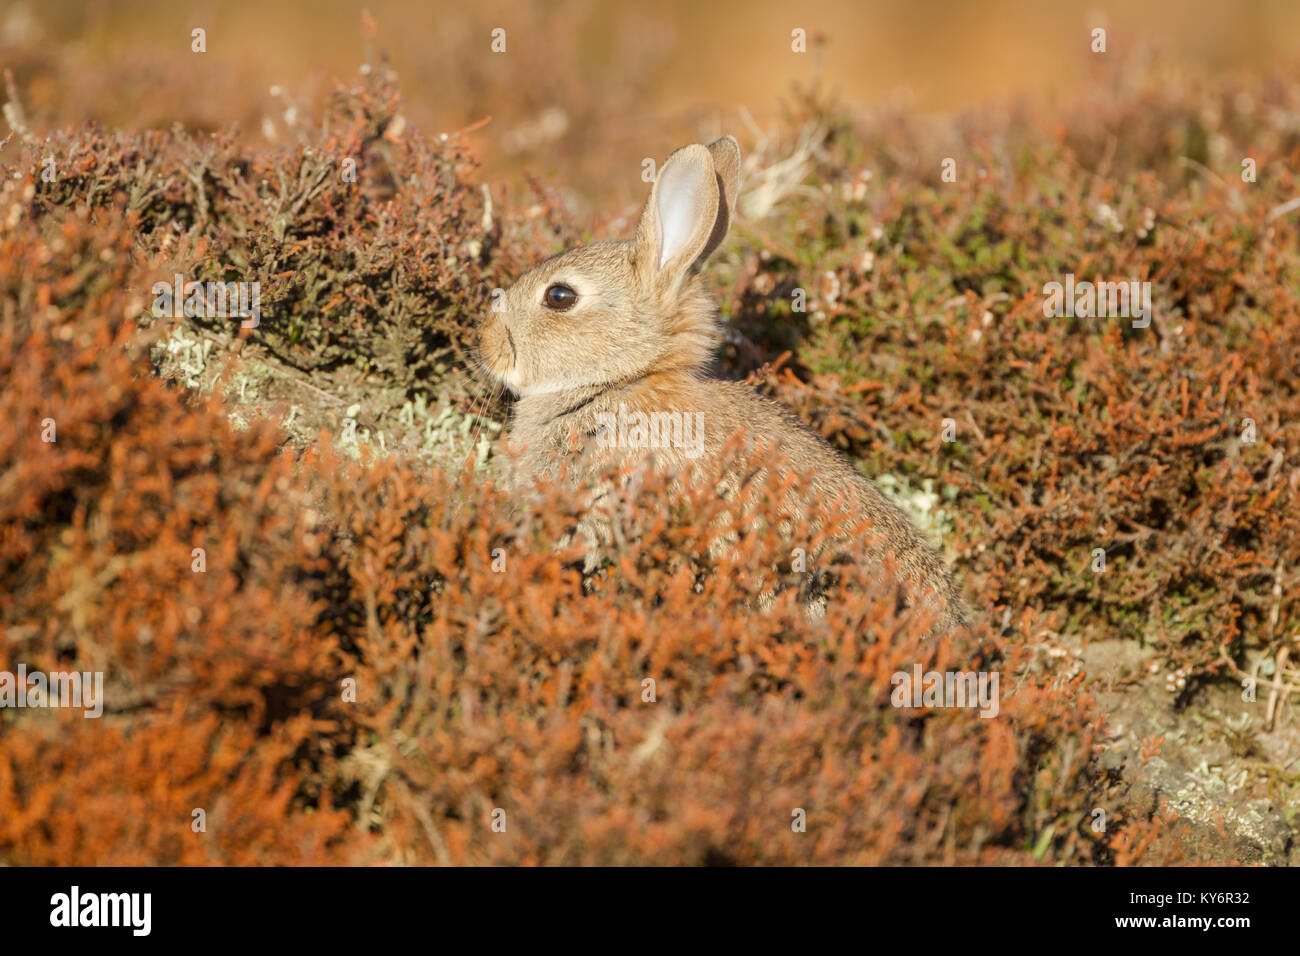 Young wild rabbit, Latin name Oryctolagus cuniculus, sitting among heather on moorland - Stock Image